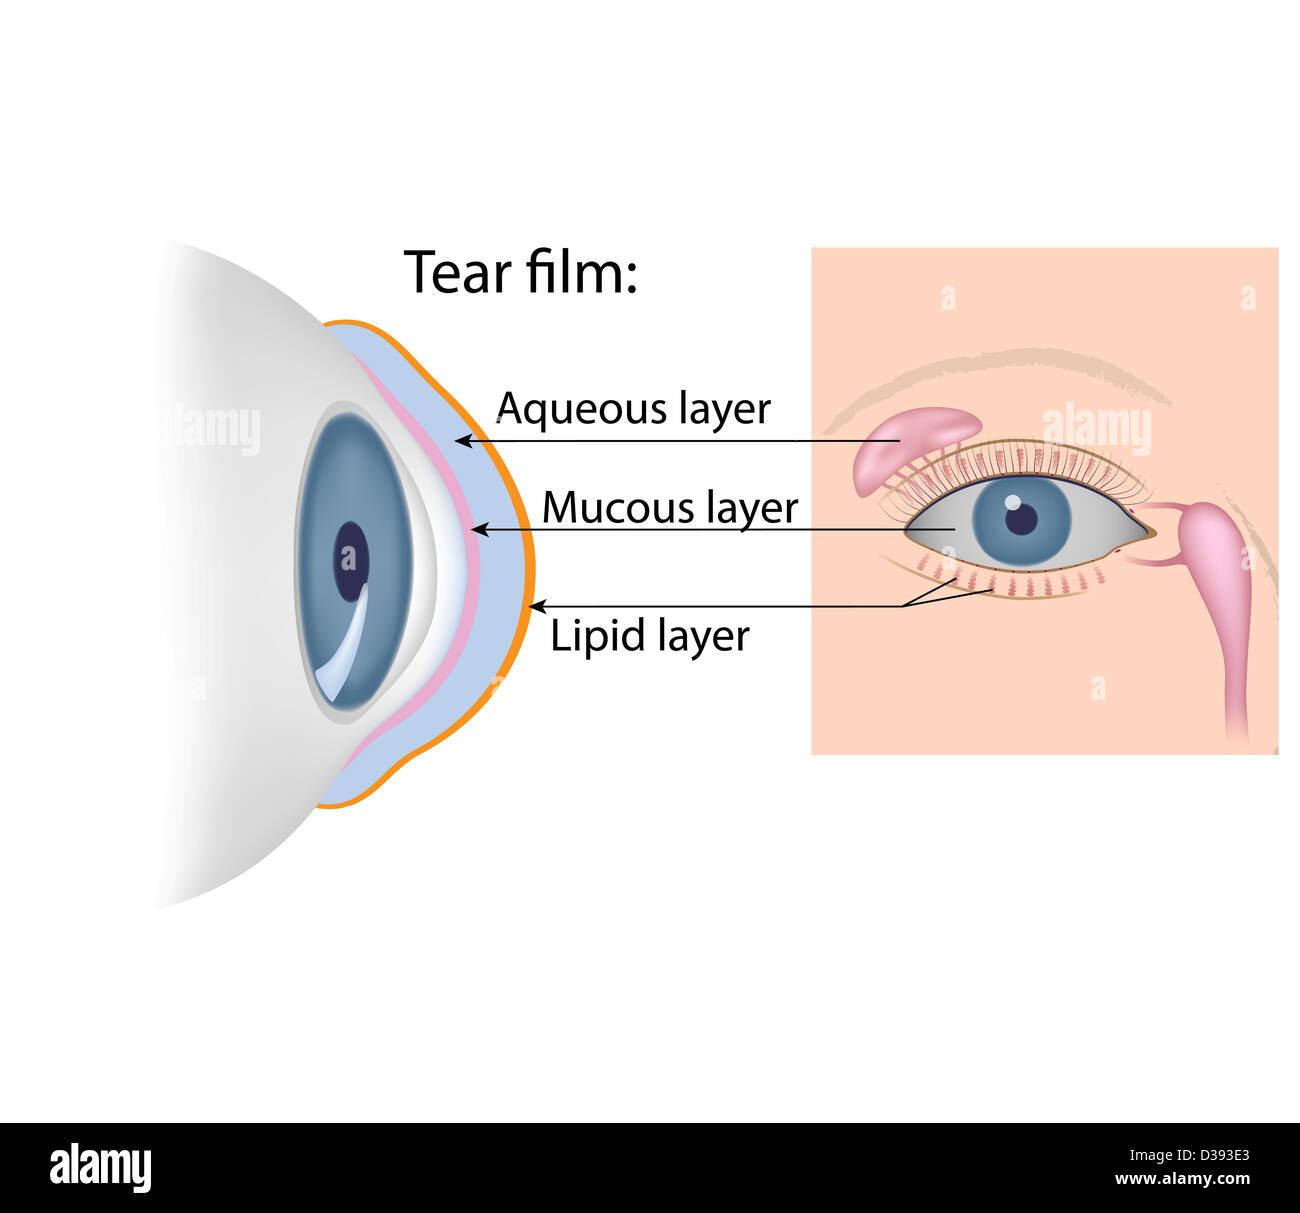 Tears chemistry - Stock Image